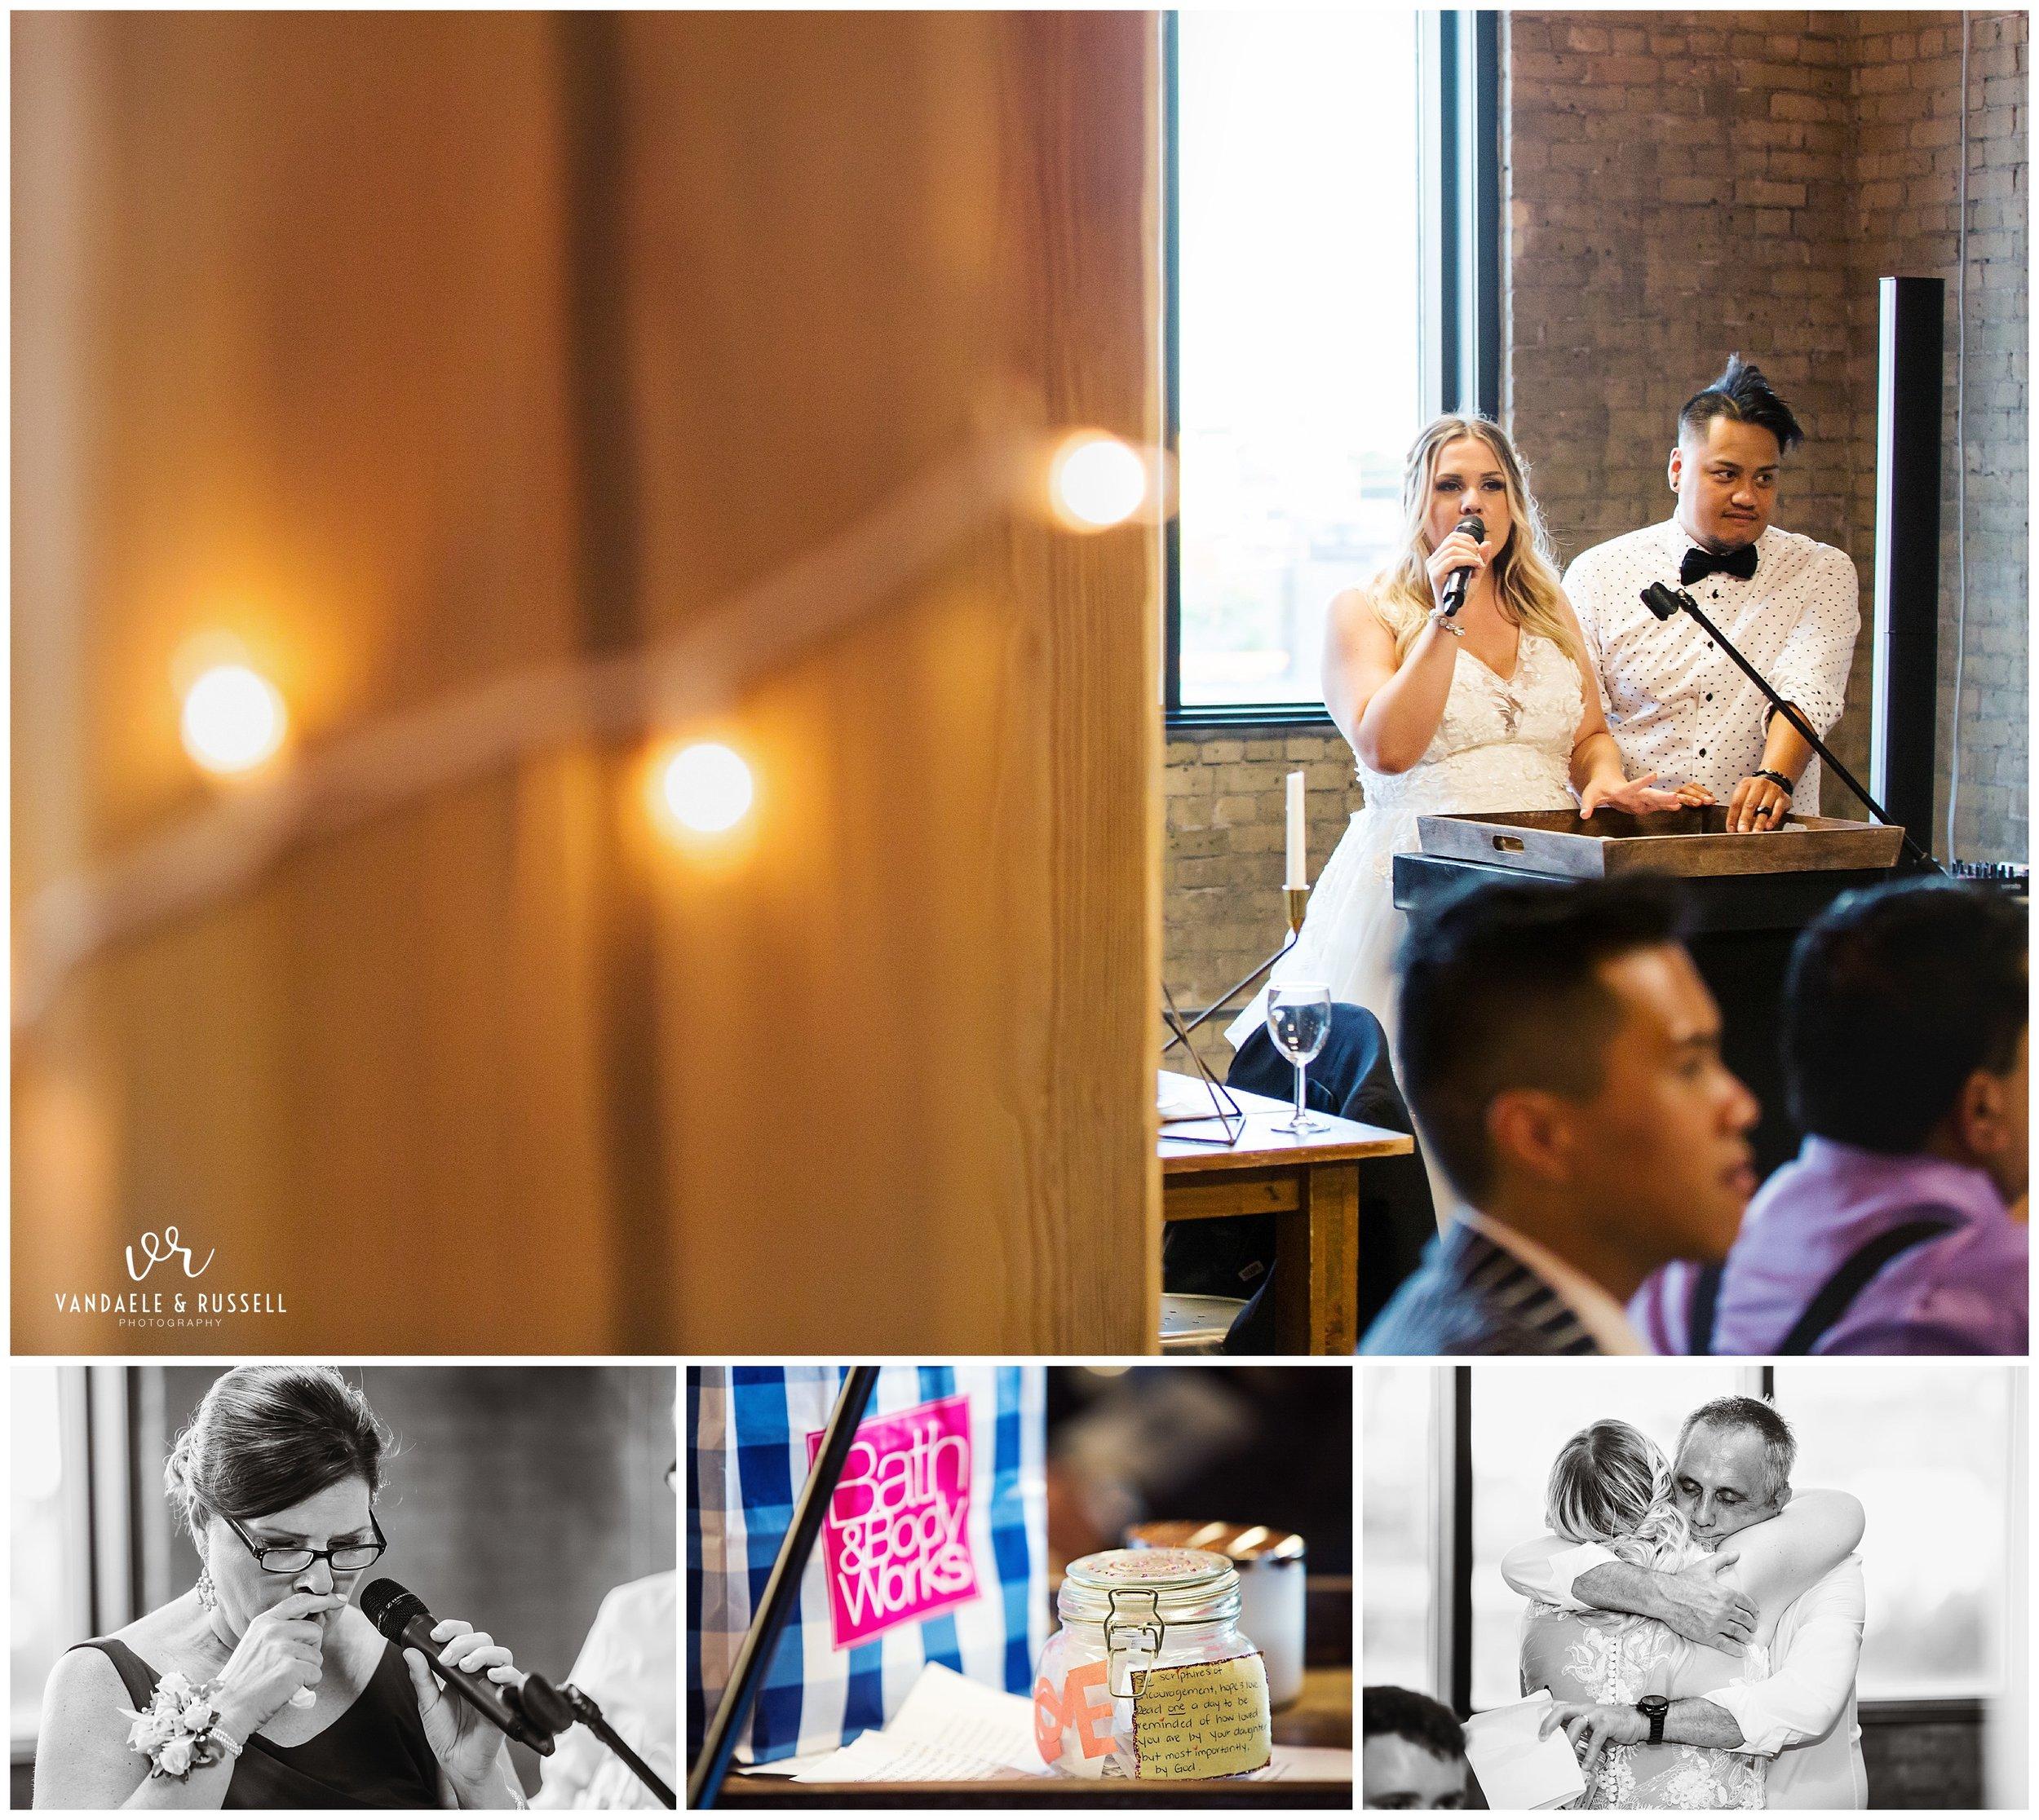 VanDaele-Russell-Wedding-Photography-London-Toronto-Ontario_0125.jpg